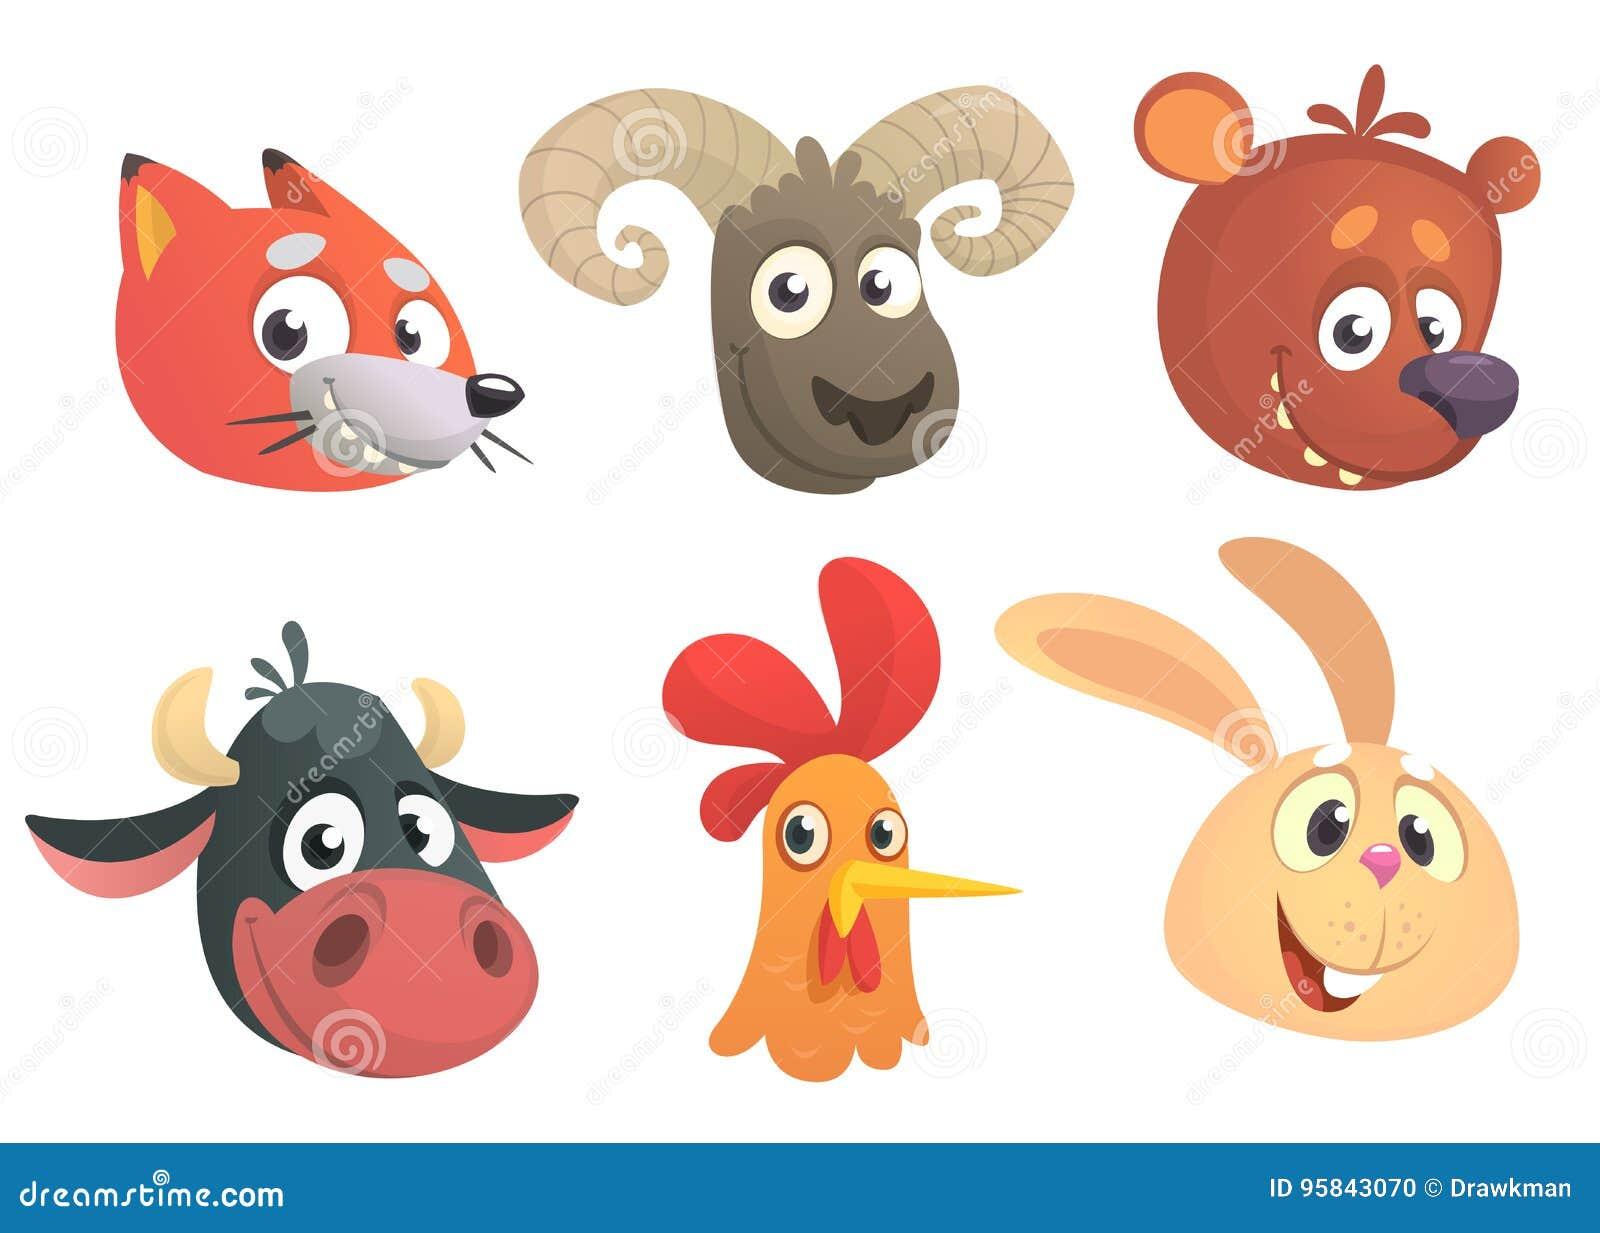 Cartoon Forest Animals. Vector Illustration. Fox, Sheep